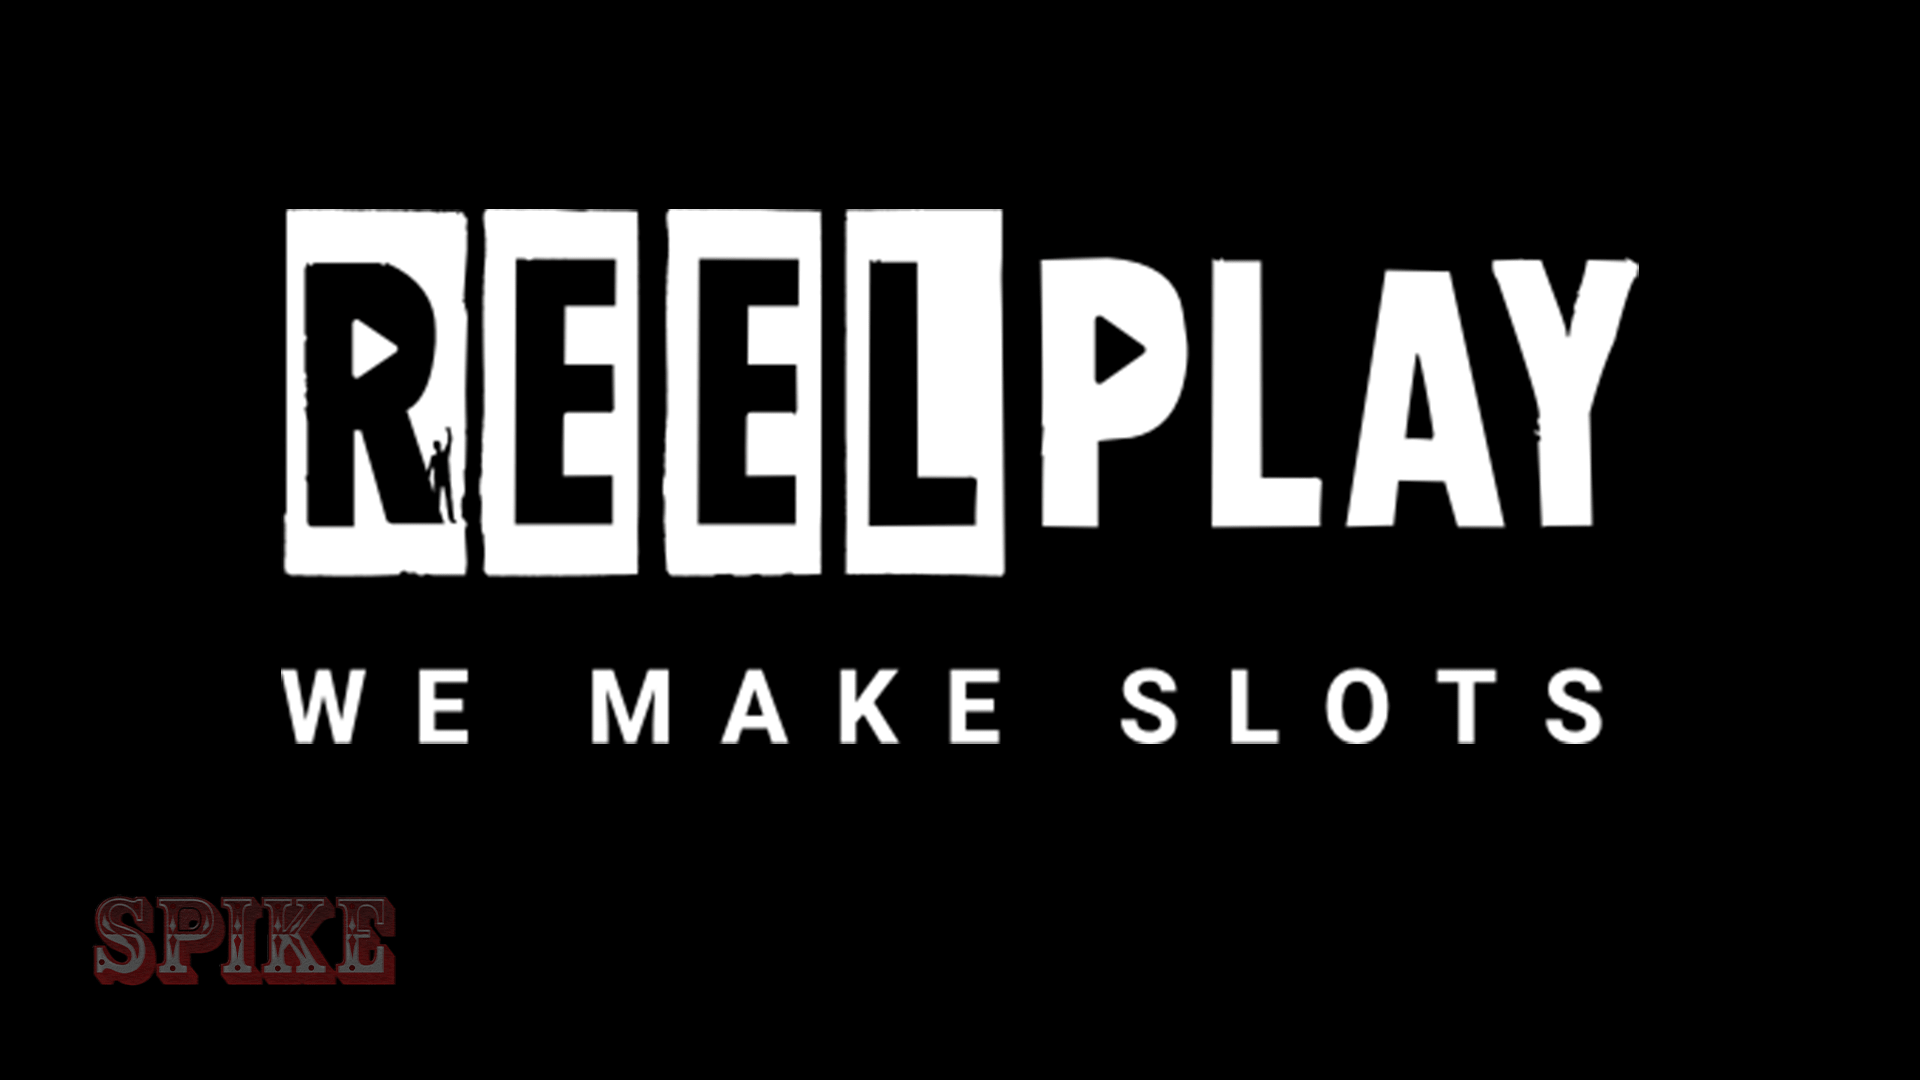 reelplay producer online slots free demo